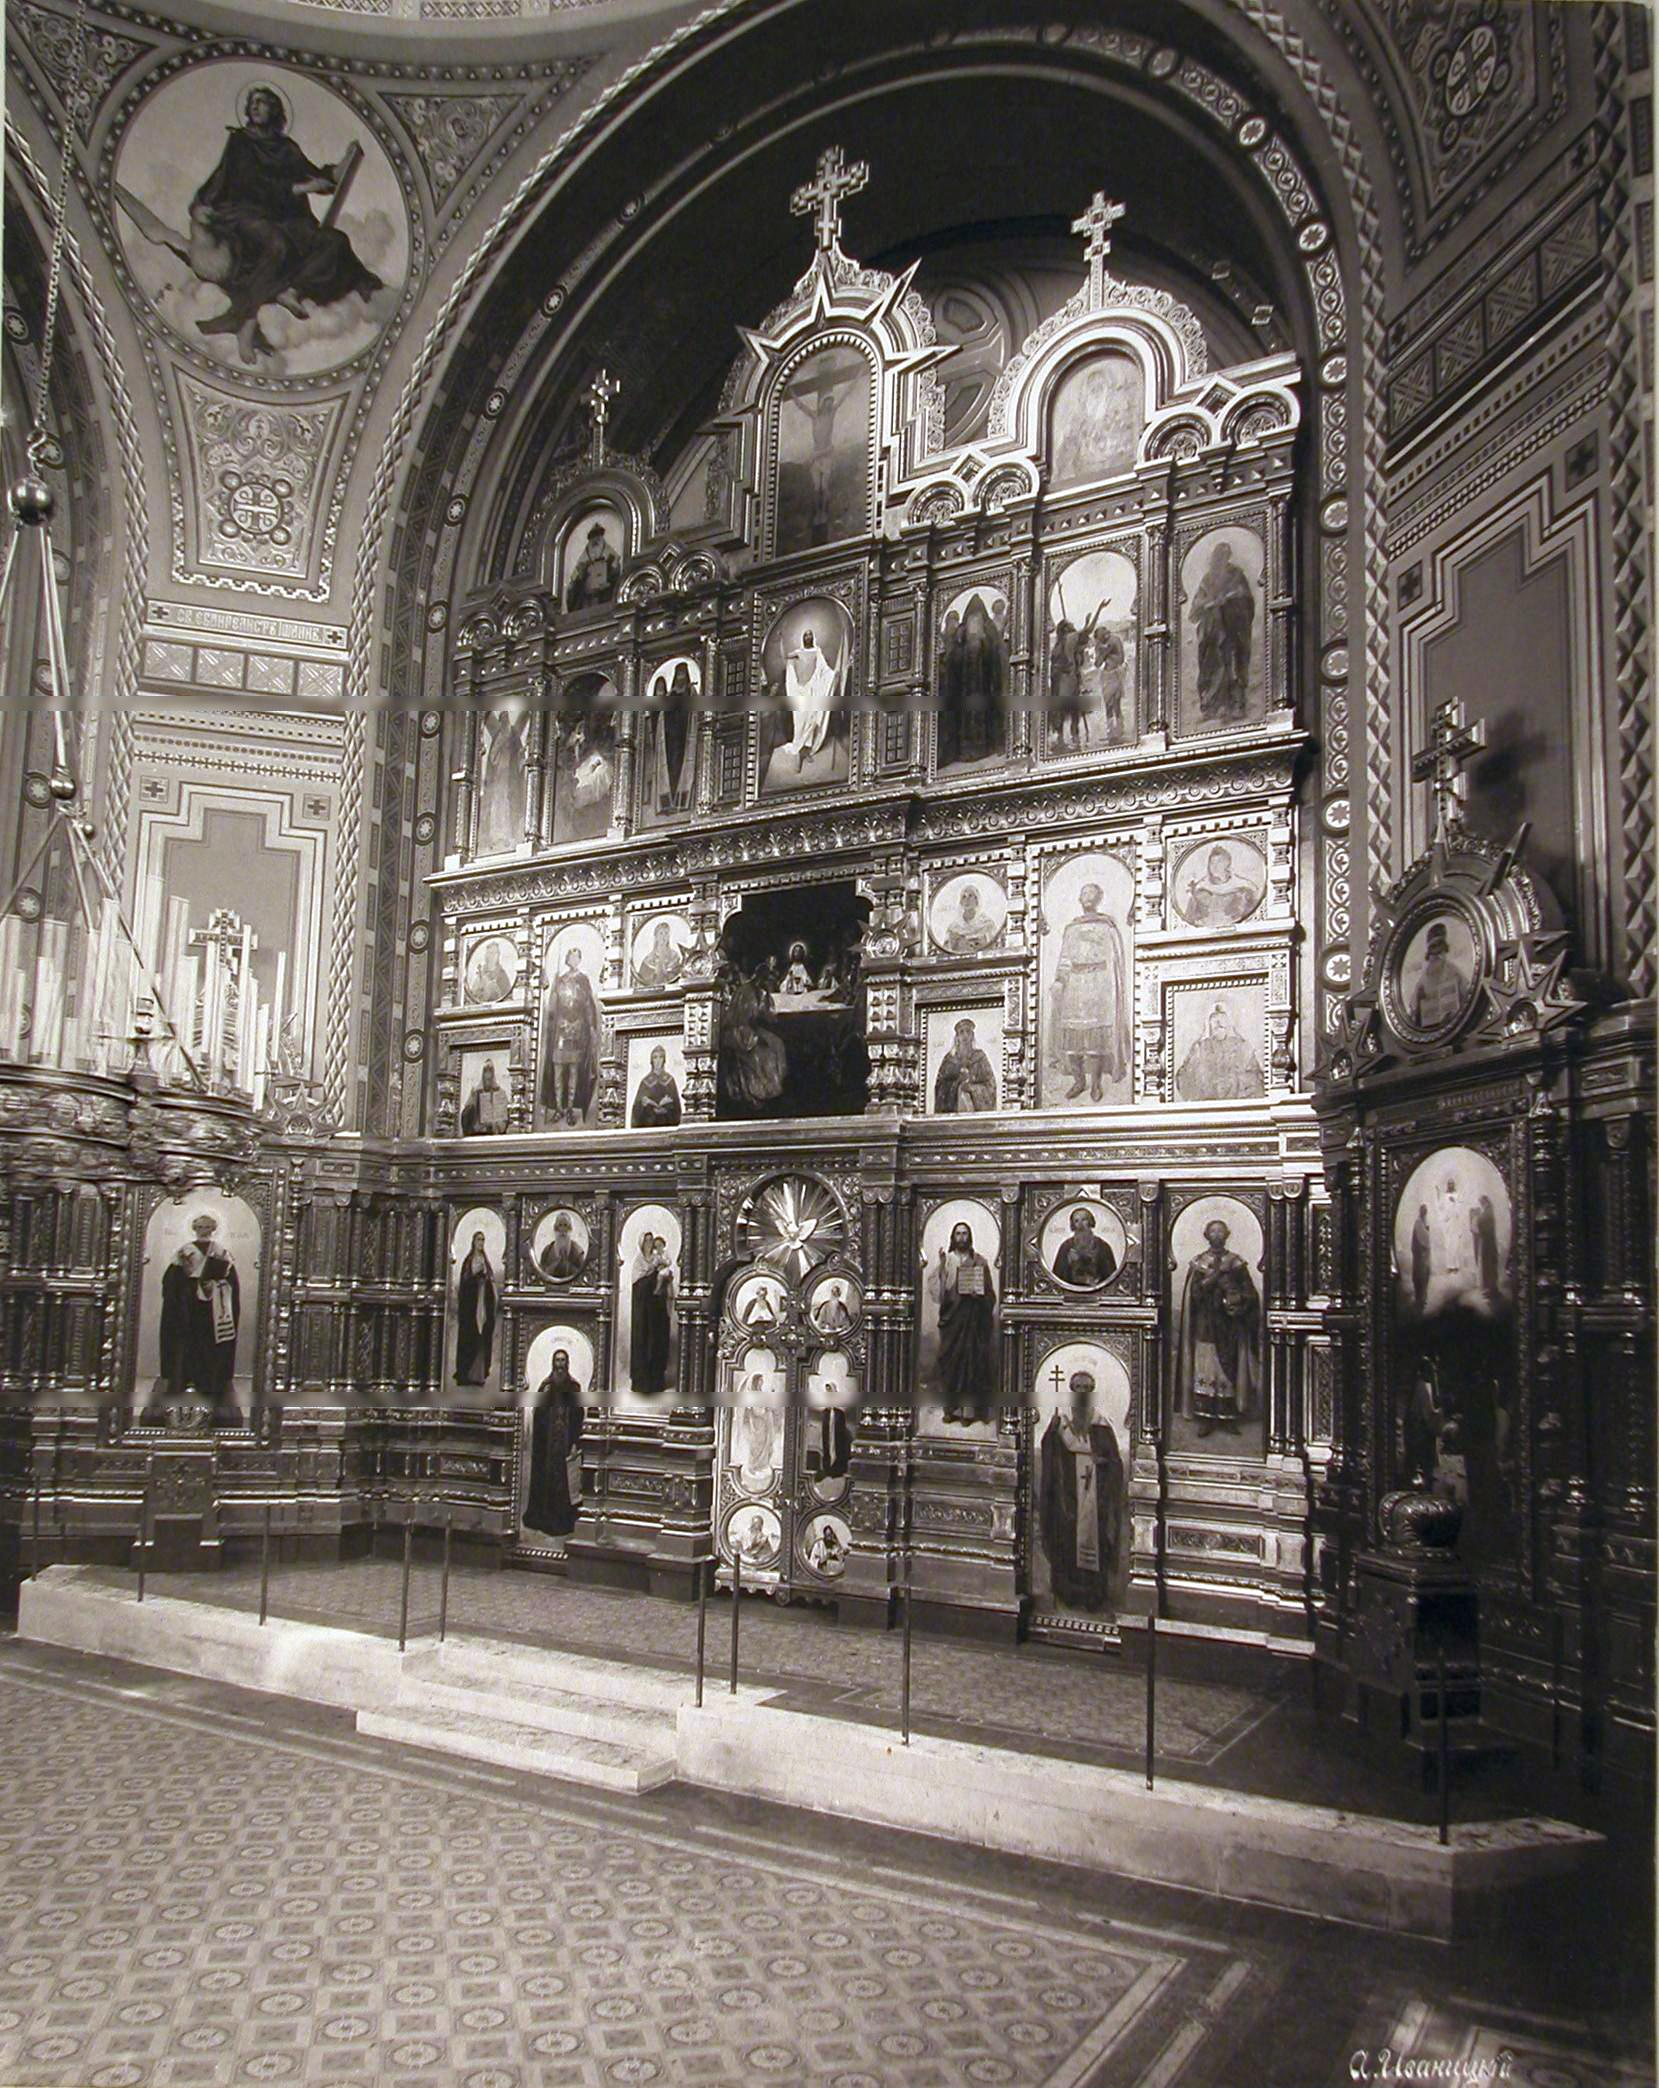 Filechrist The Savior Cathedral In Borki Interior View 3